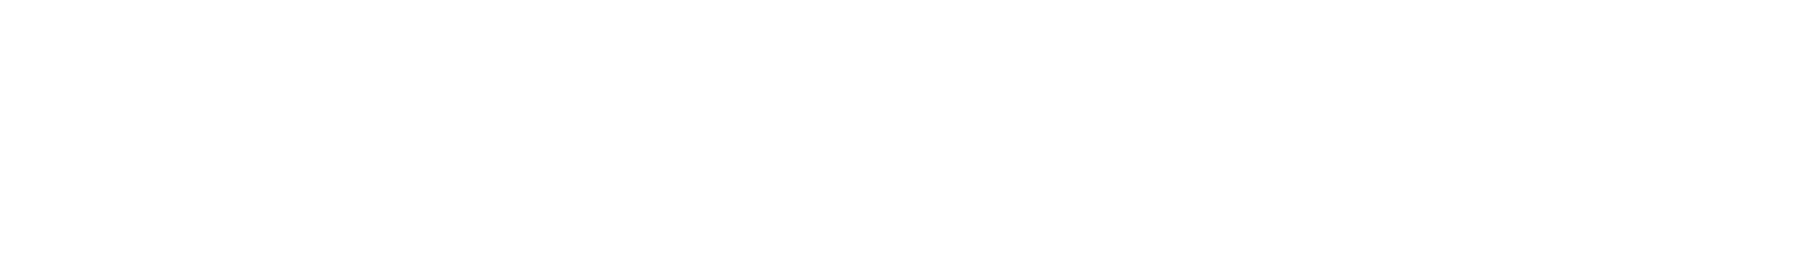 003 female